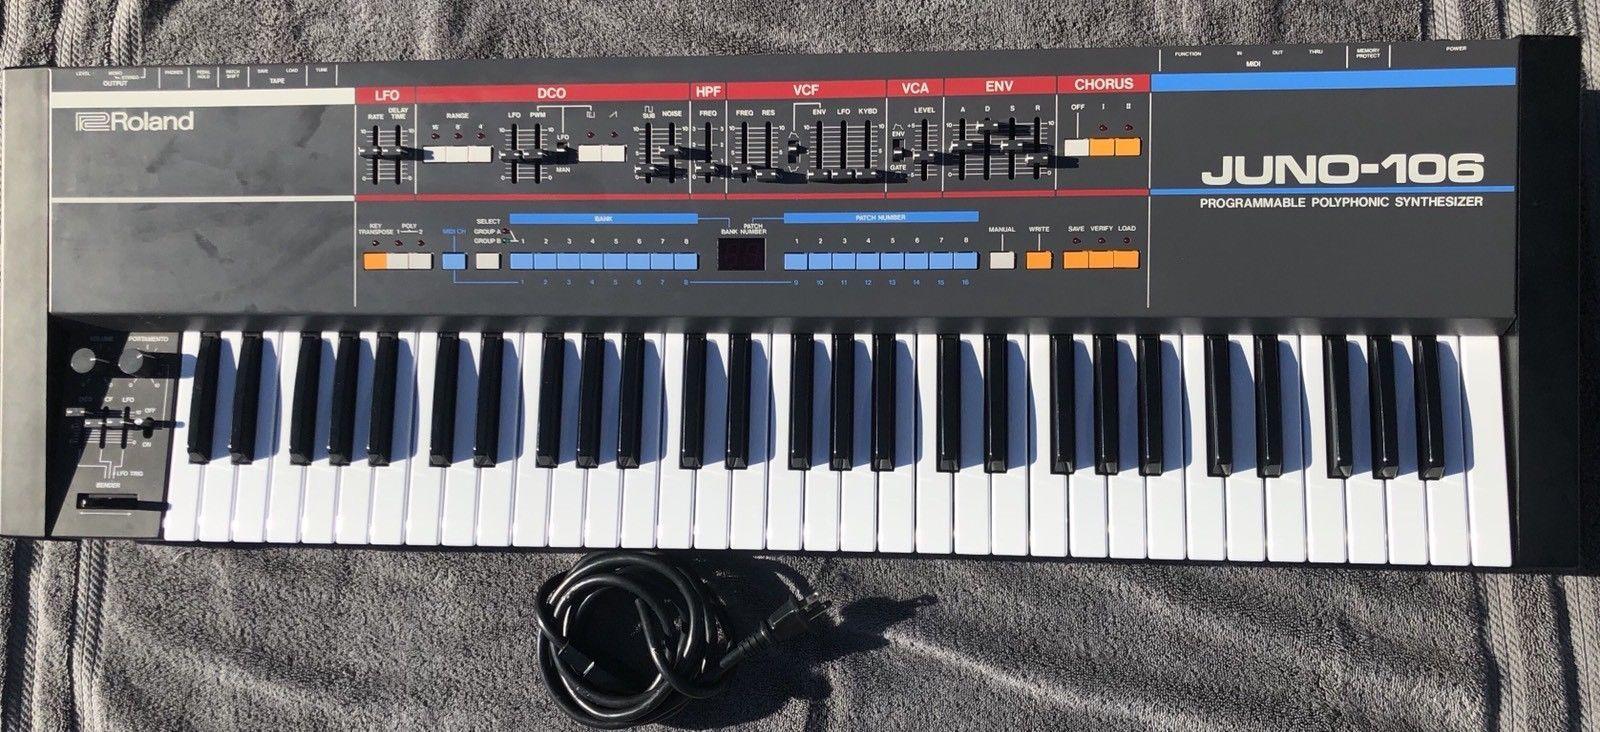 Roland Juno106 Juno 106 Vintage Analog Synth Keyboard 61 Key